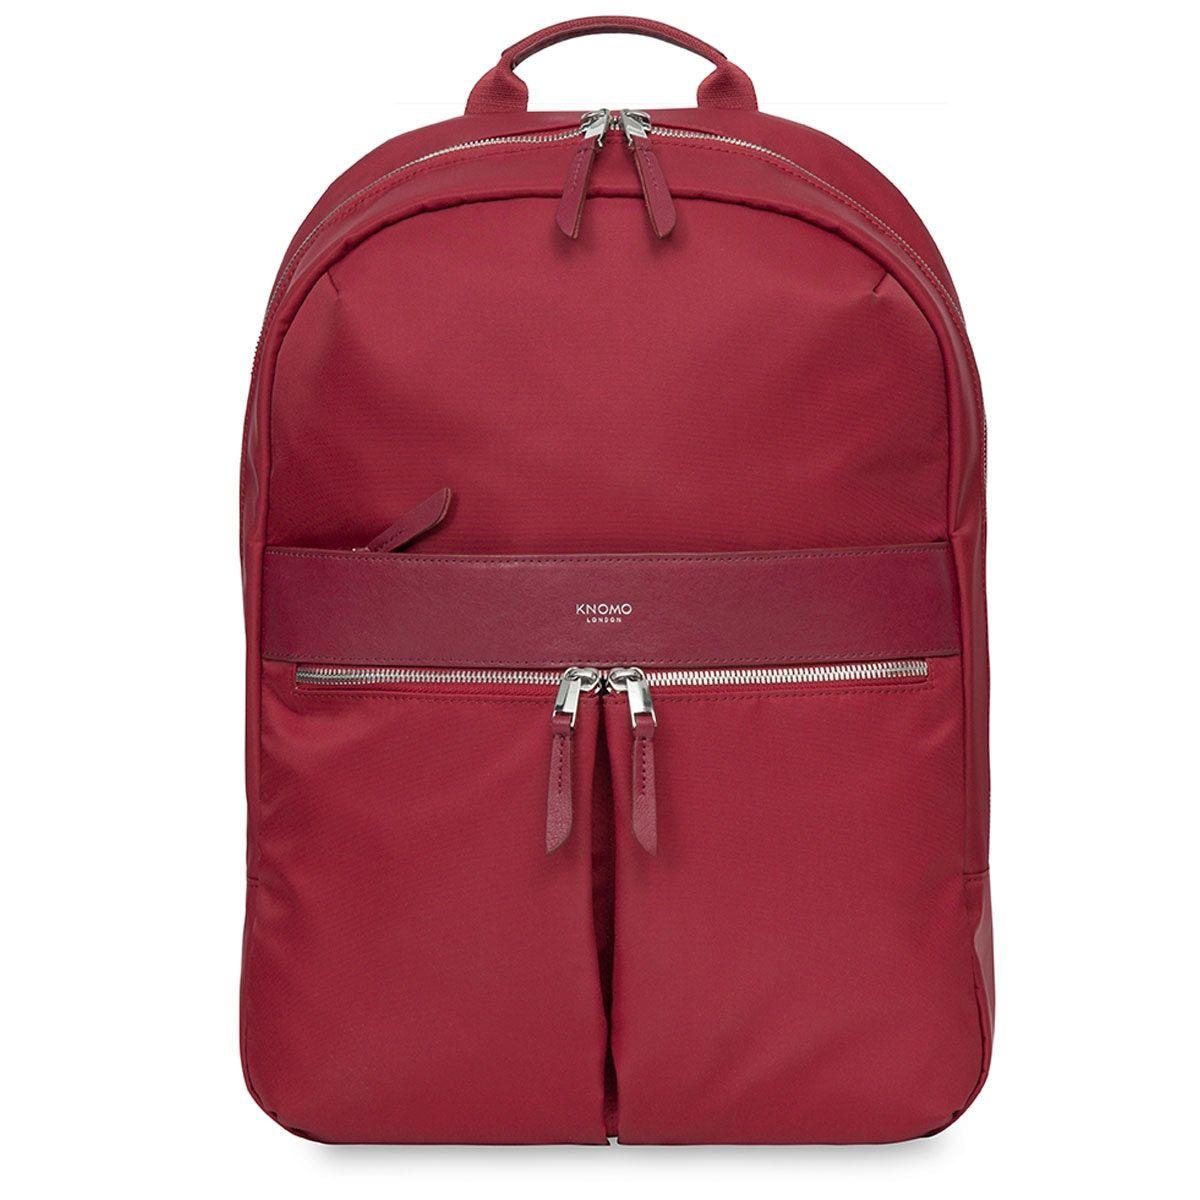 Laptop rugzak Knomo Beauchamp Backpack Cherry 14 inch